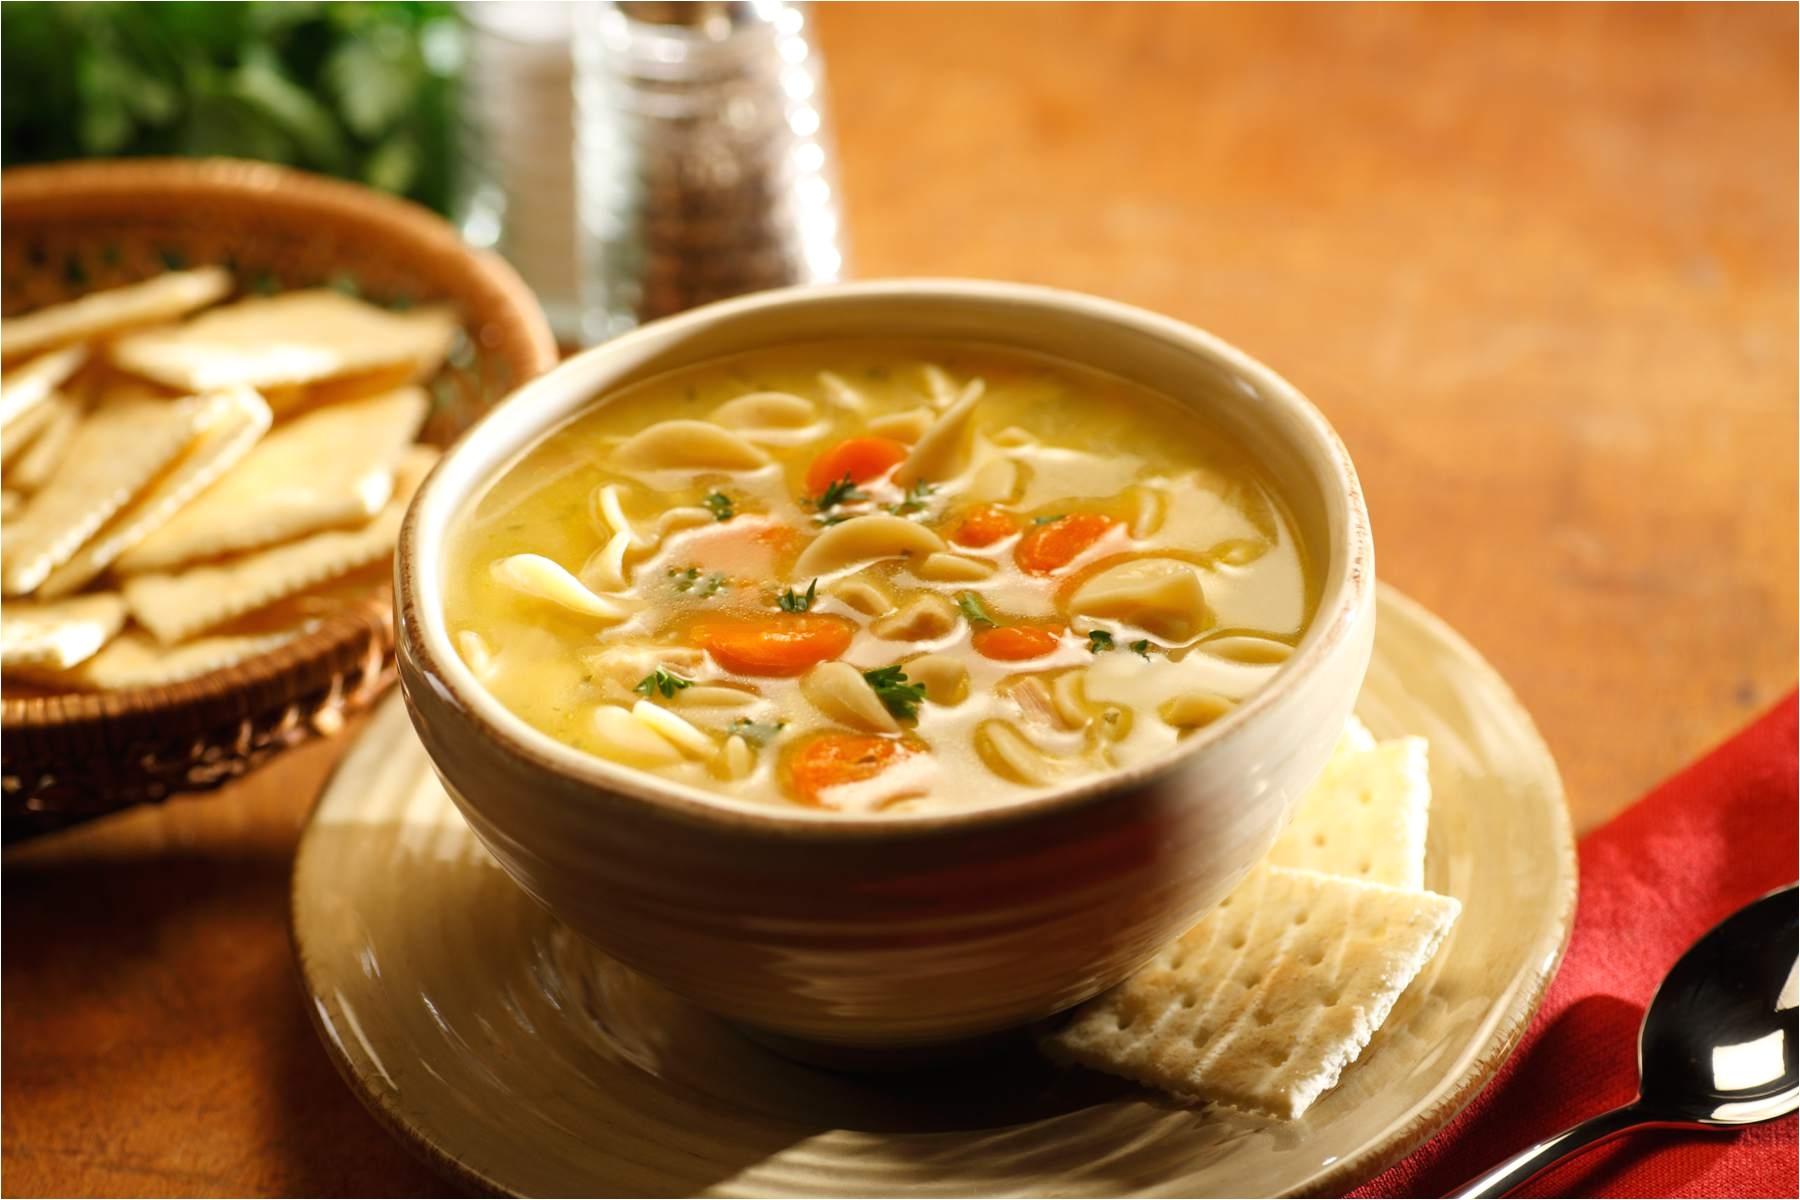 chicken noodle soup g18 56a8c0ce5f9b58b7d0f4d15f